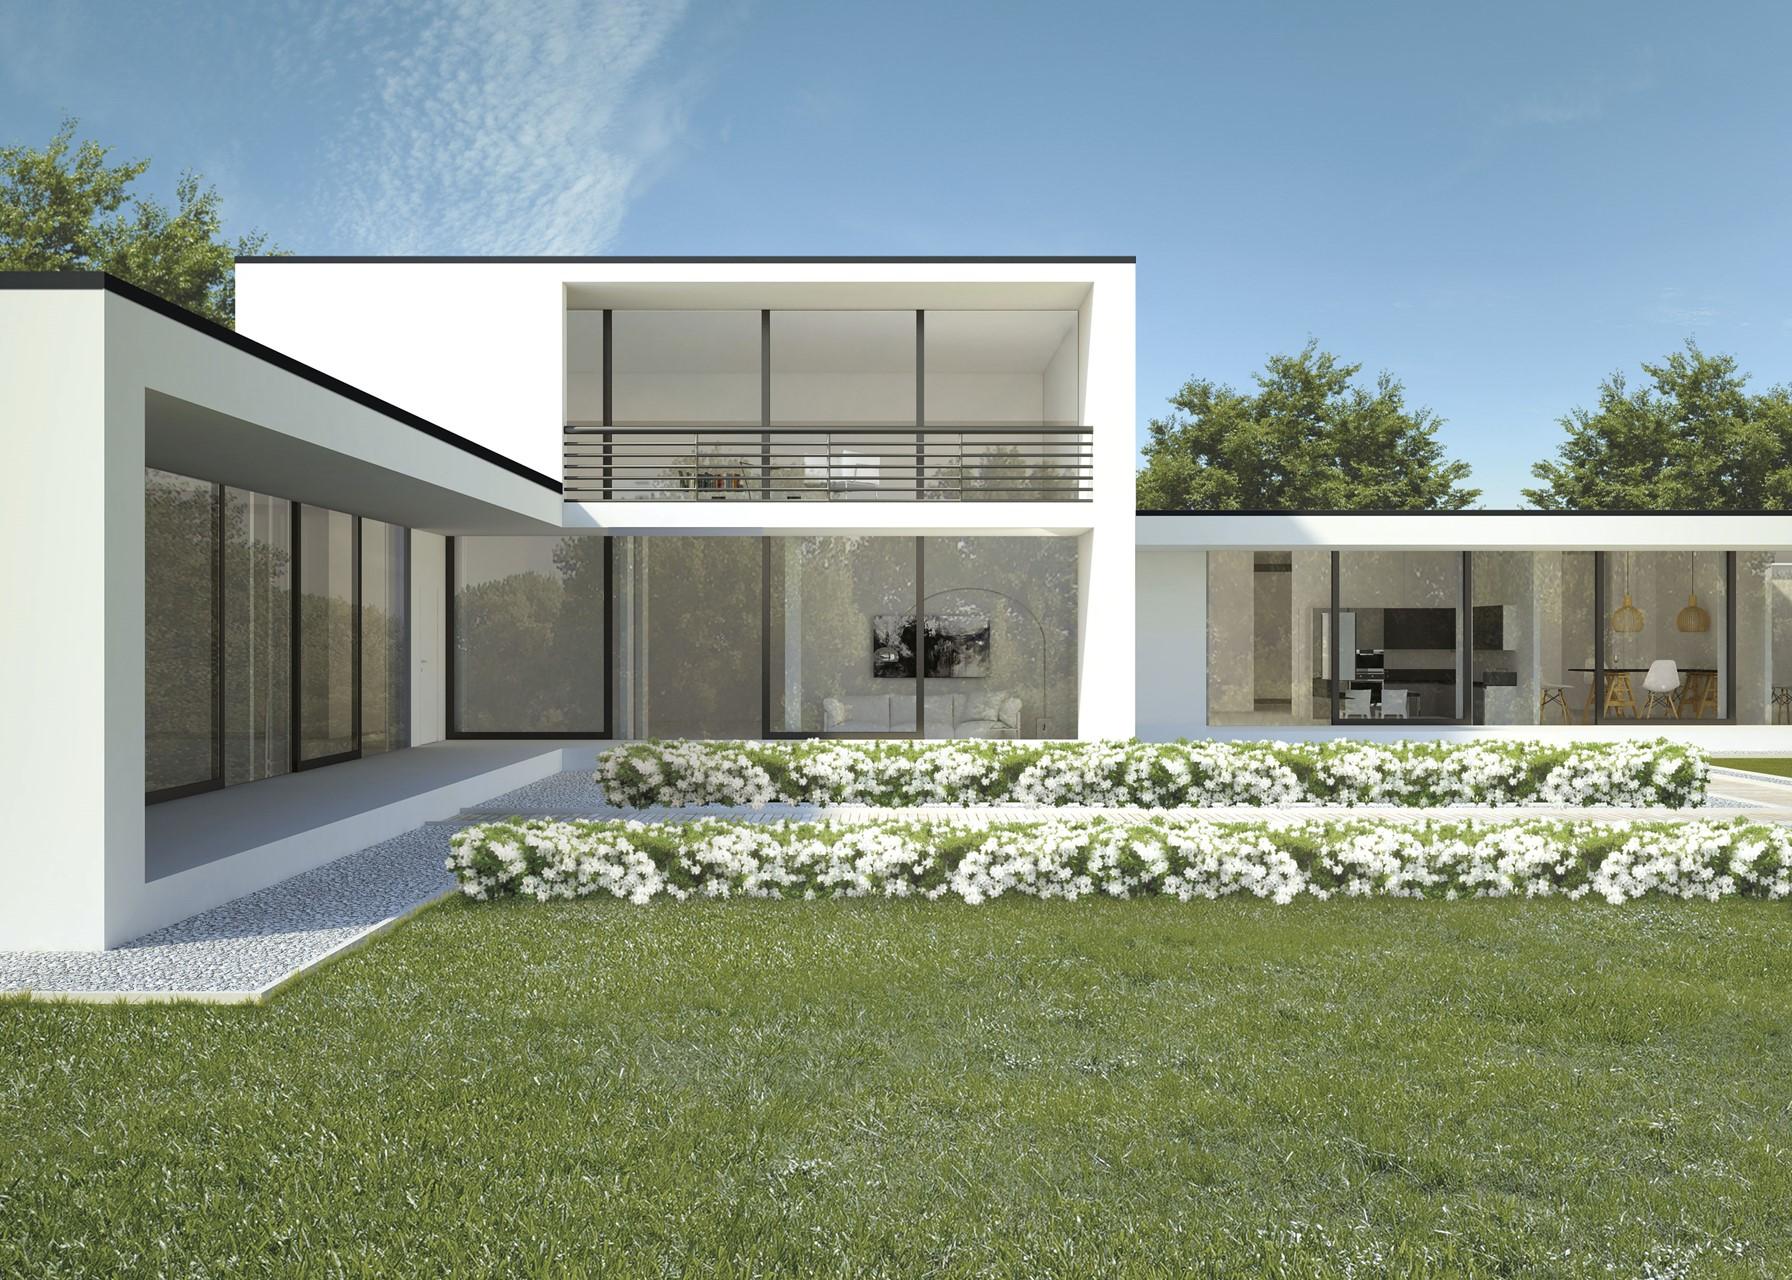 castilglieri-porte-finestre-2